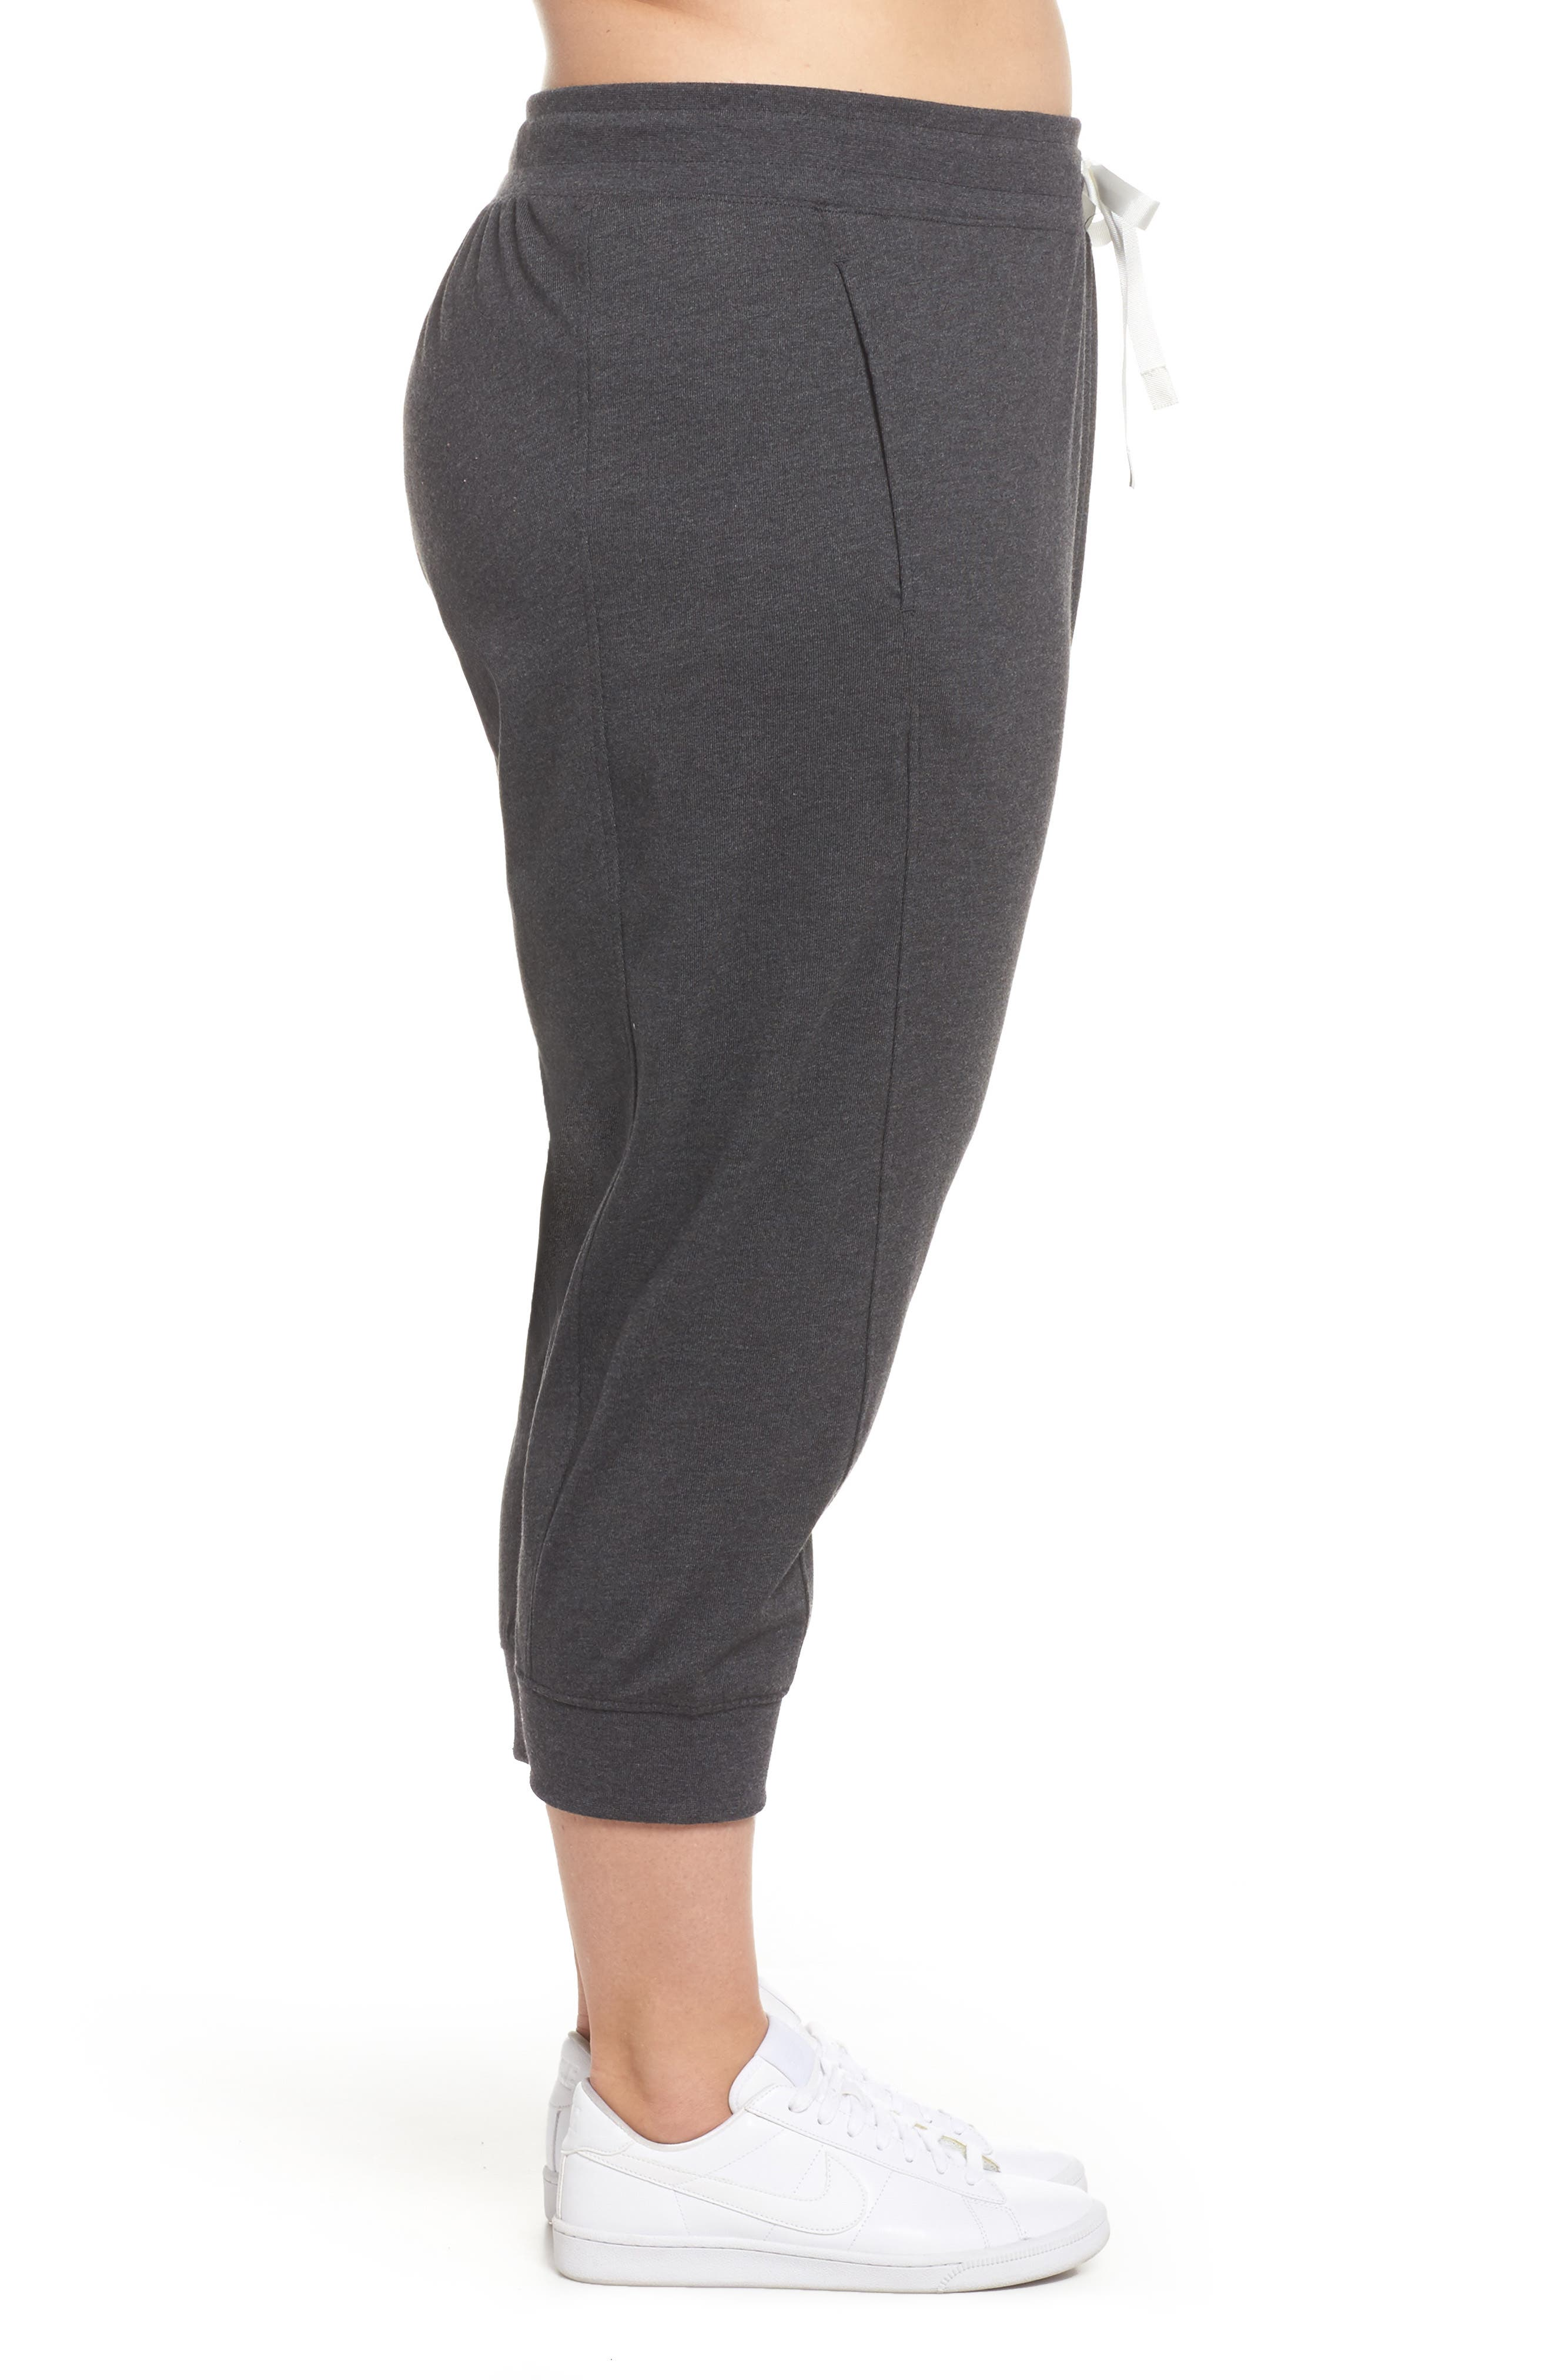 Sportswear Gym Capris,                             Alternate thumbnail 3, color,                             Black Heather/ Sail